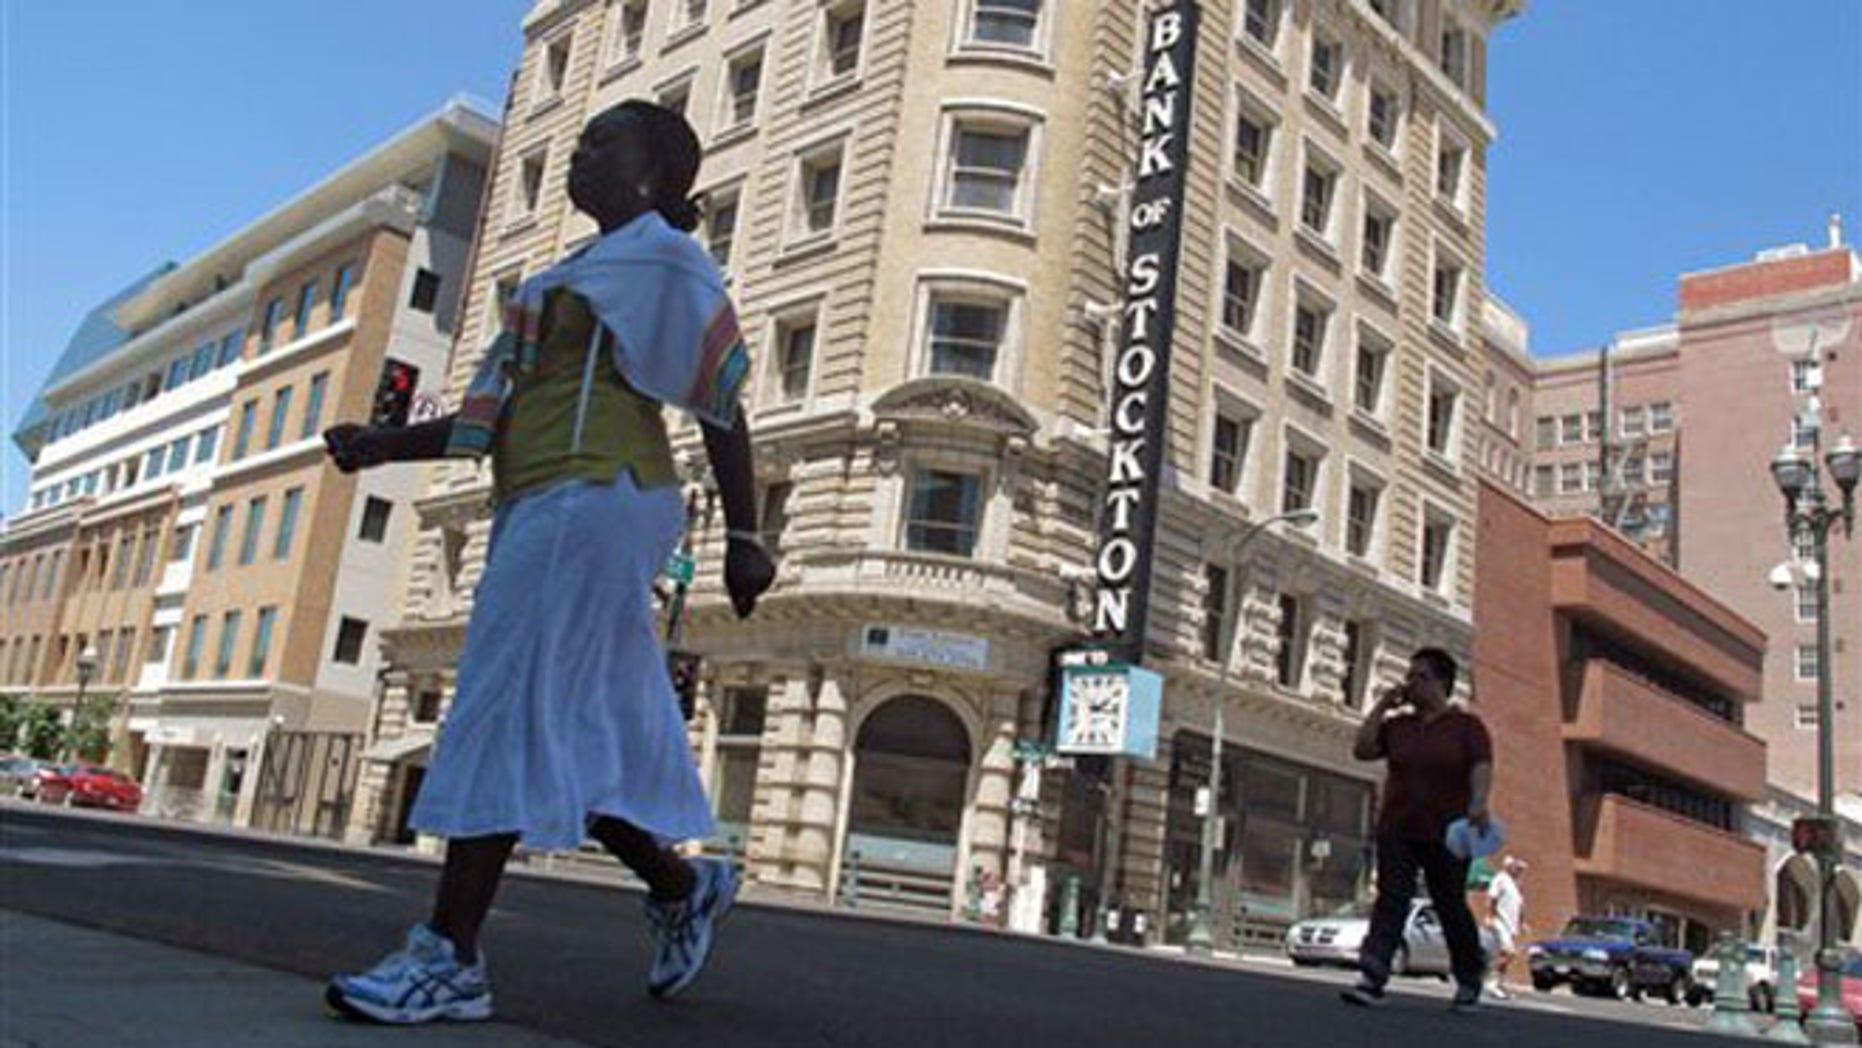 June 27, 2012: Pedestrians cross a street near the Bank of Stockton in Stockton, Calif.